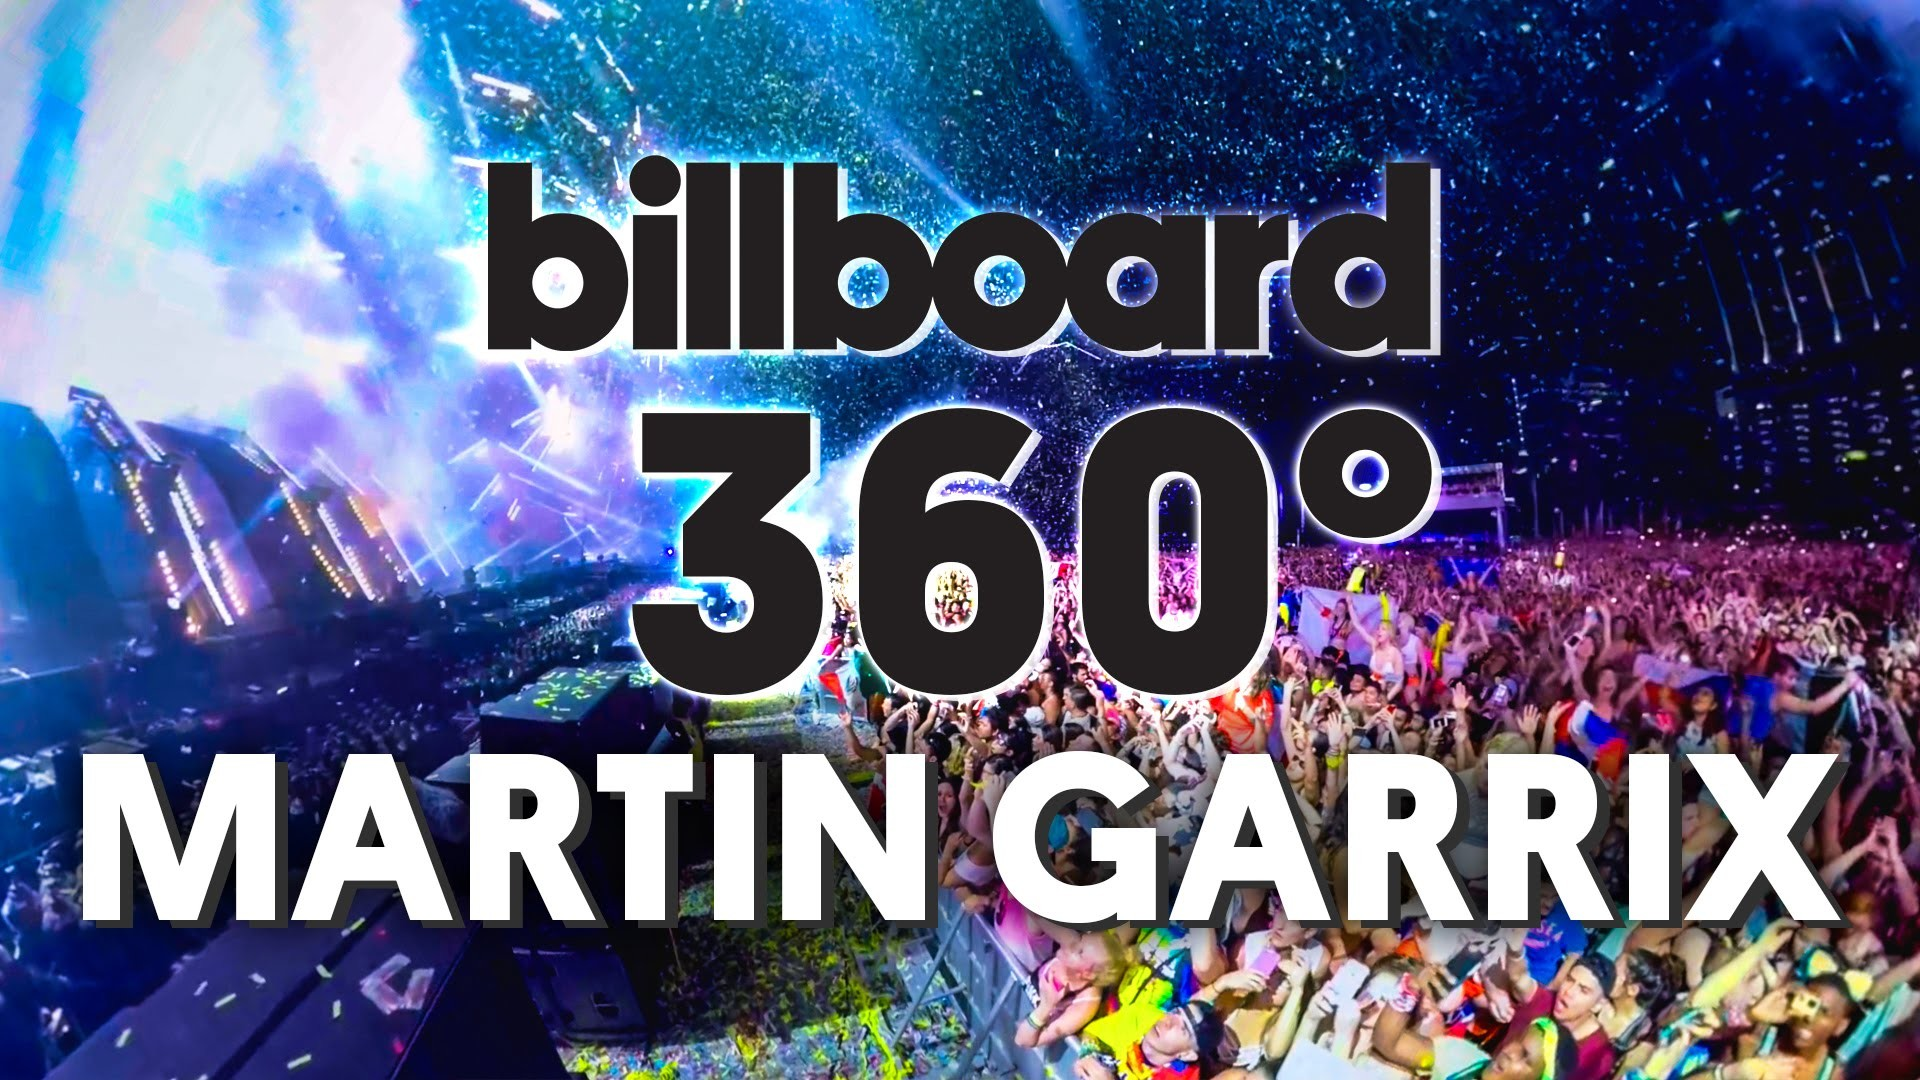 Martin Garrix @ Ultra Music Festival 2016, Miami   360 VIDEO VR experience  – YouTube